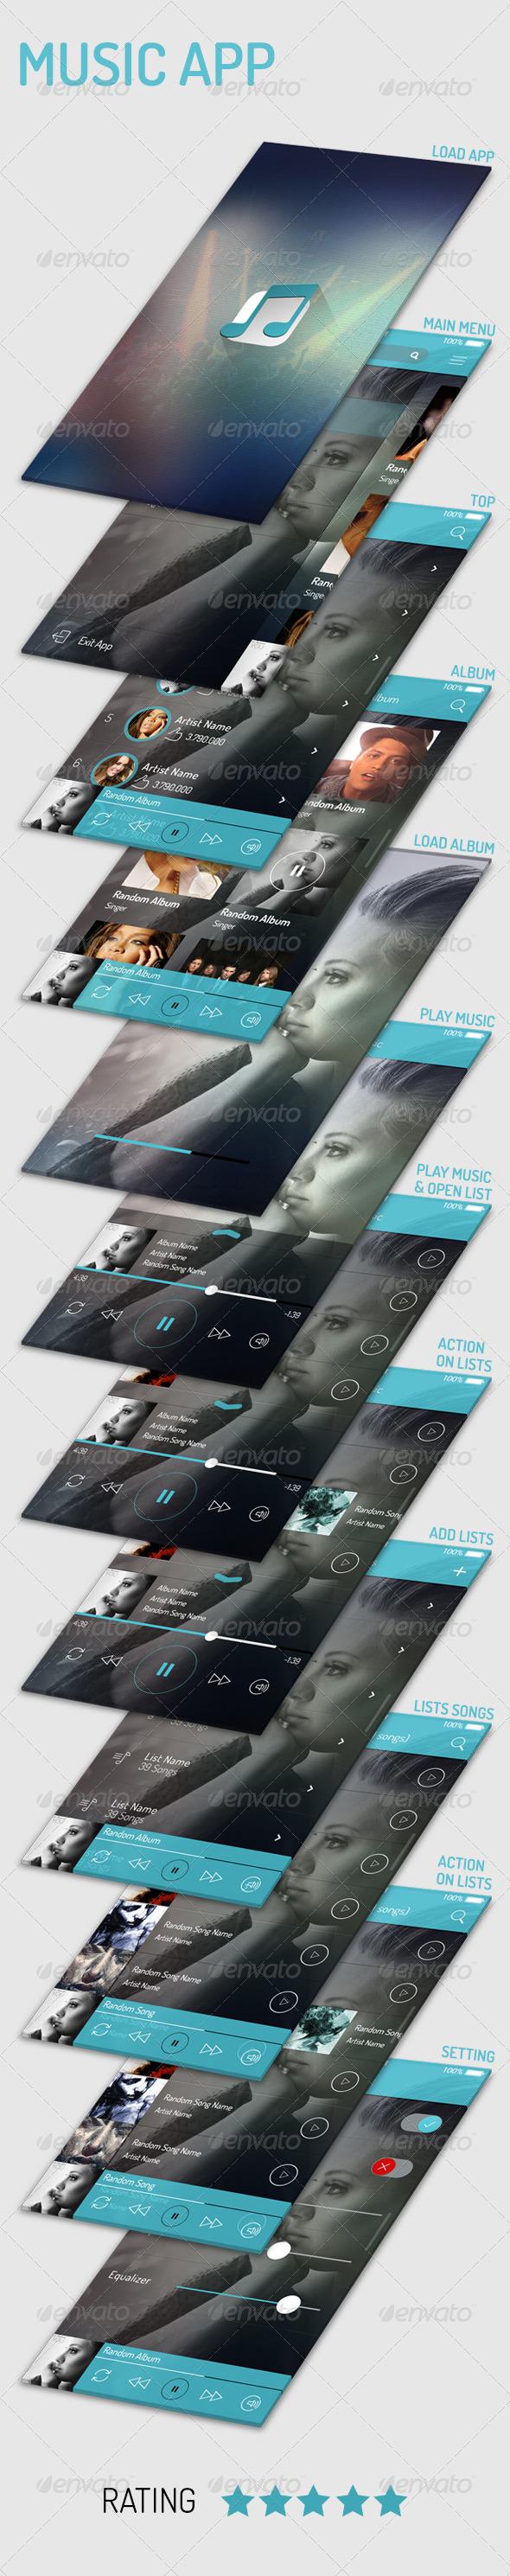 GraphicRiver Music App 5454917